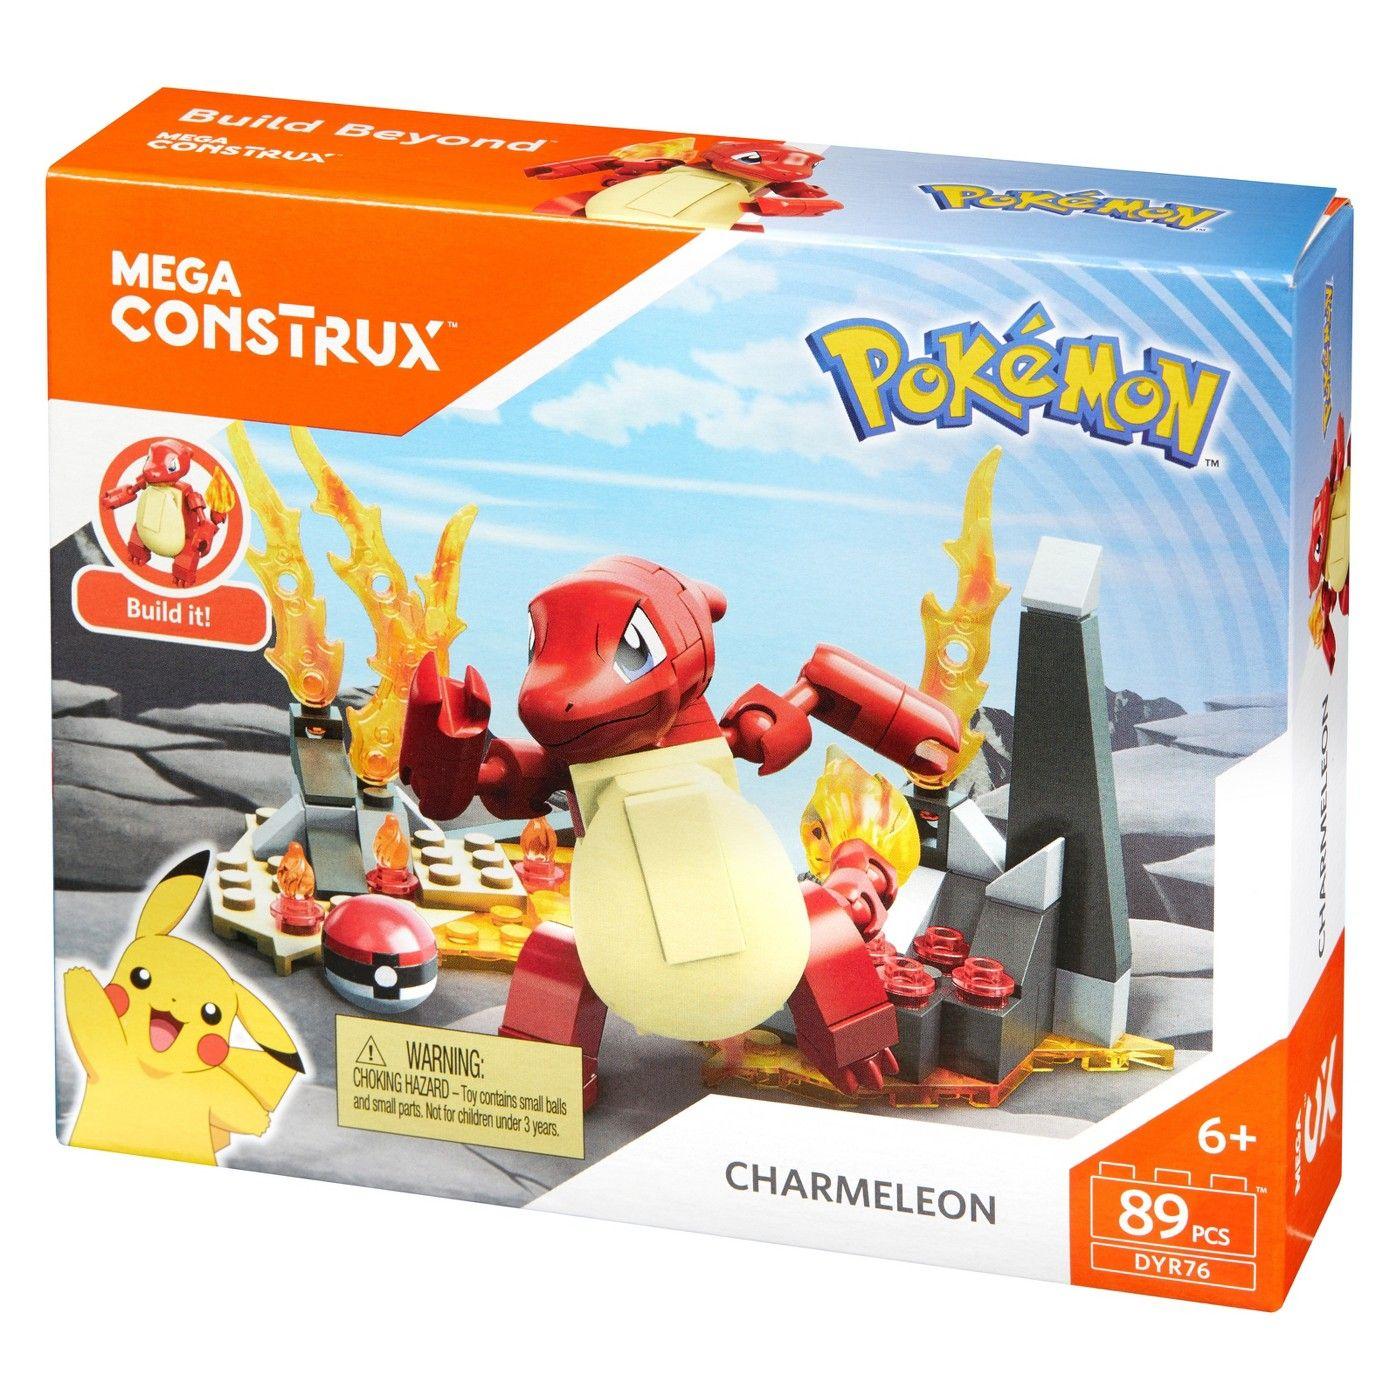 Mega Construx Pokemon Charmeleon Building Set #Pokemon, #Construx